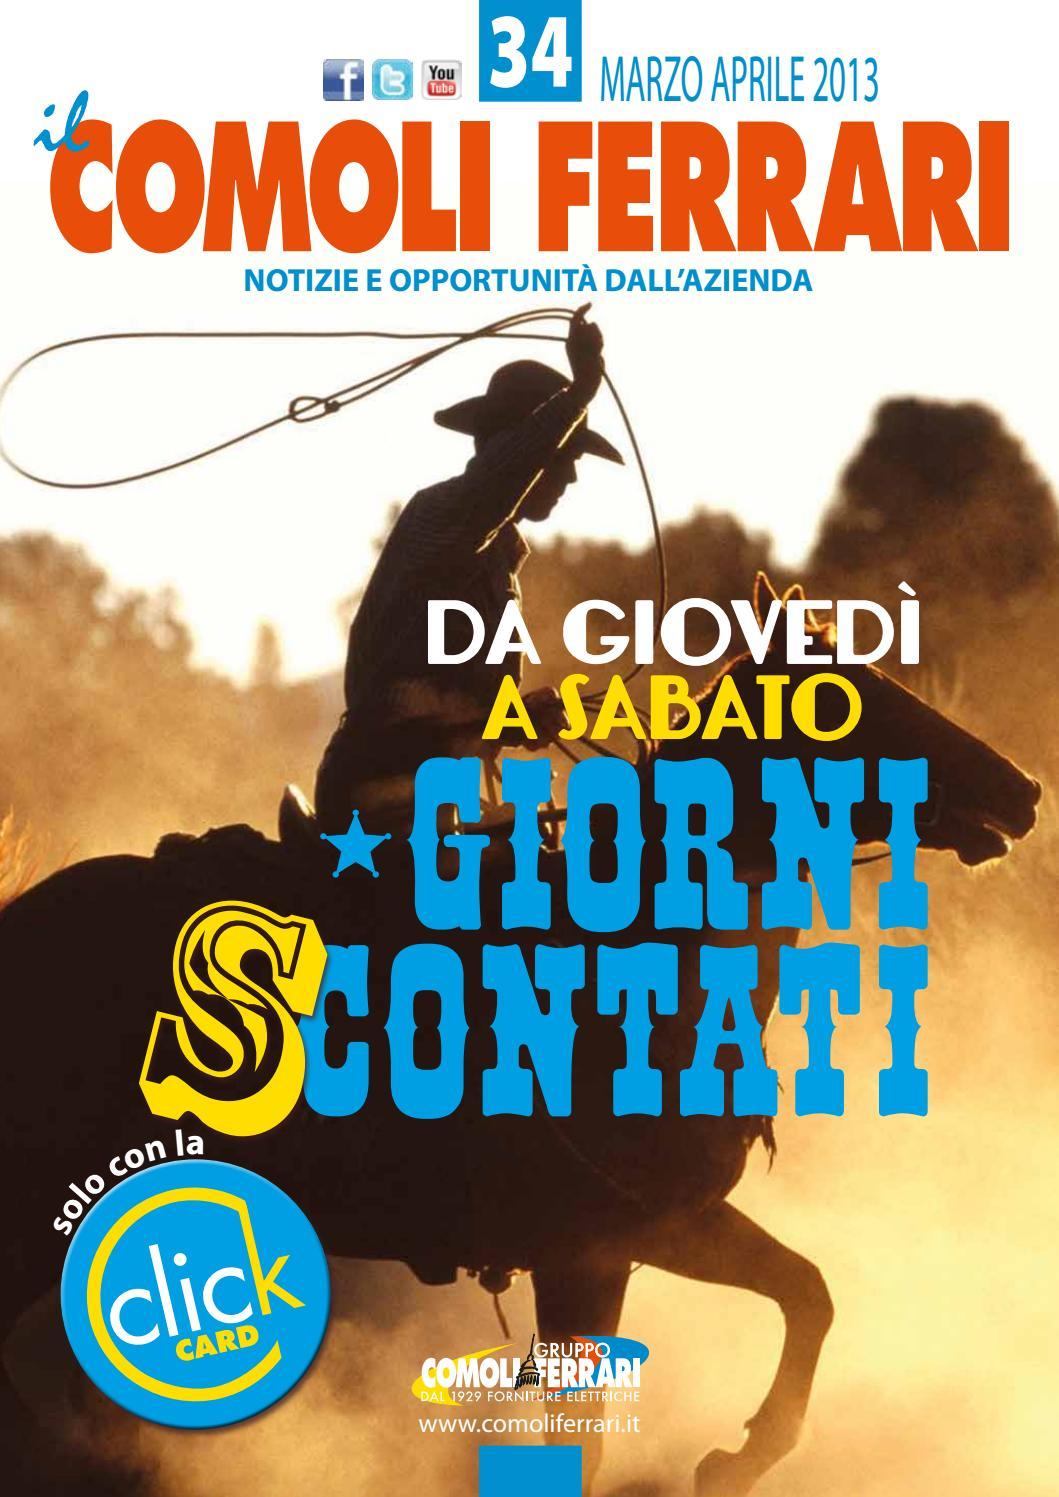 Cast Arredo Torre Annunziata il comoli ferrari n. 34 by comoli ferrari - issuu